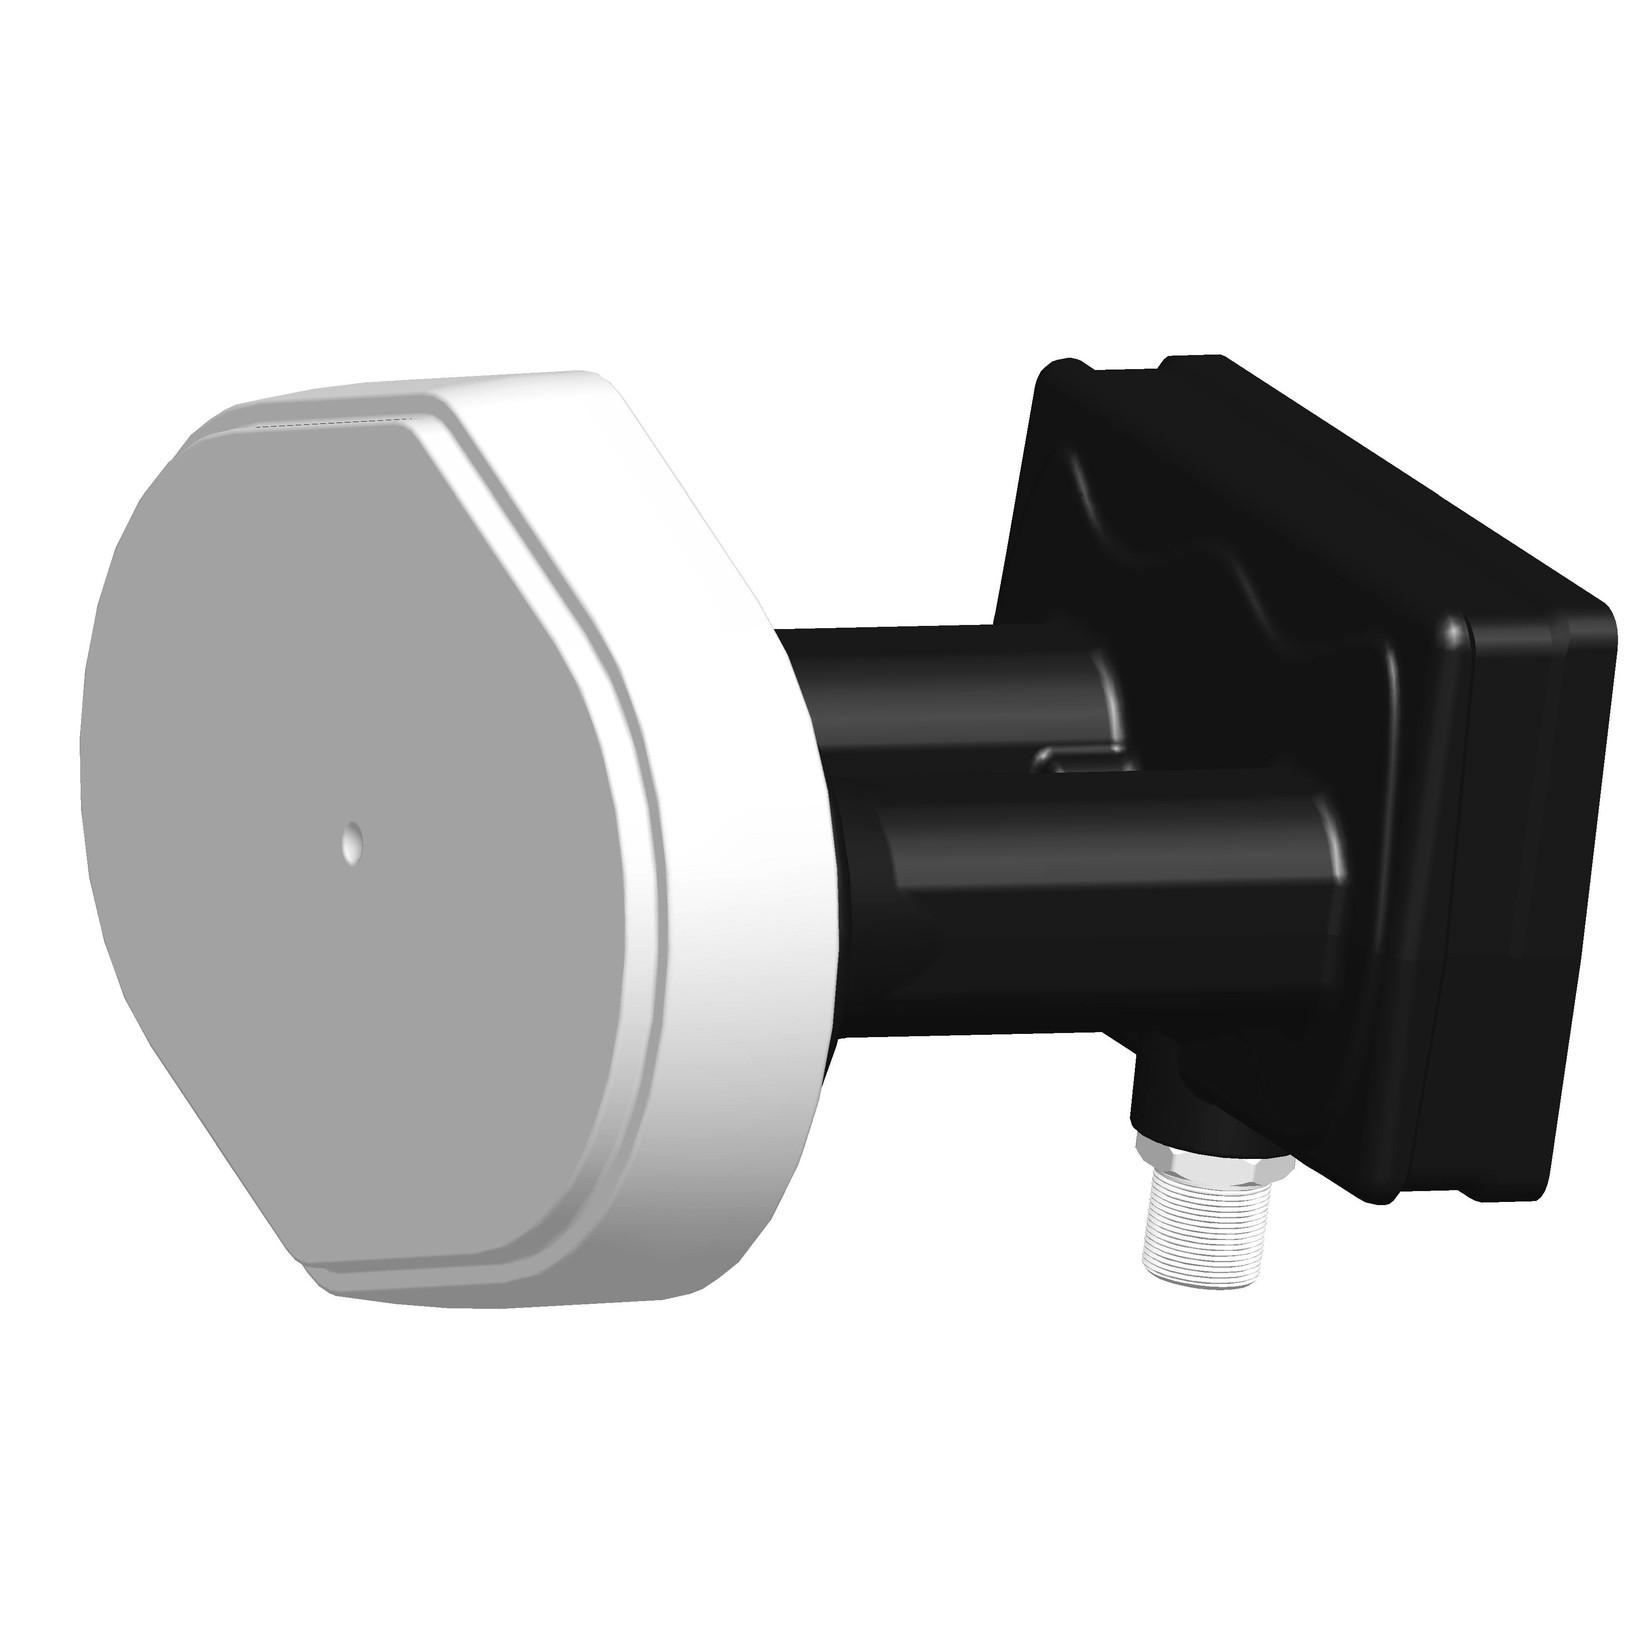 GT LNB DUOBLOC SINGLE  GT-MO3 - 4.3° antenne 60cm - 23mm